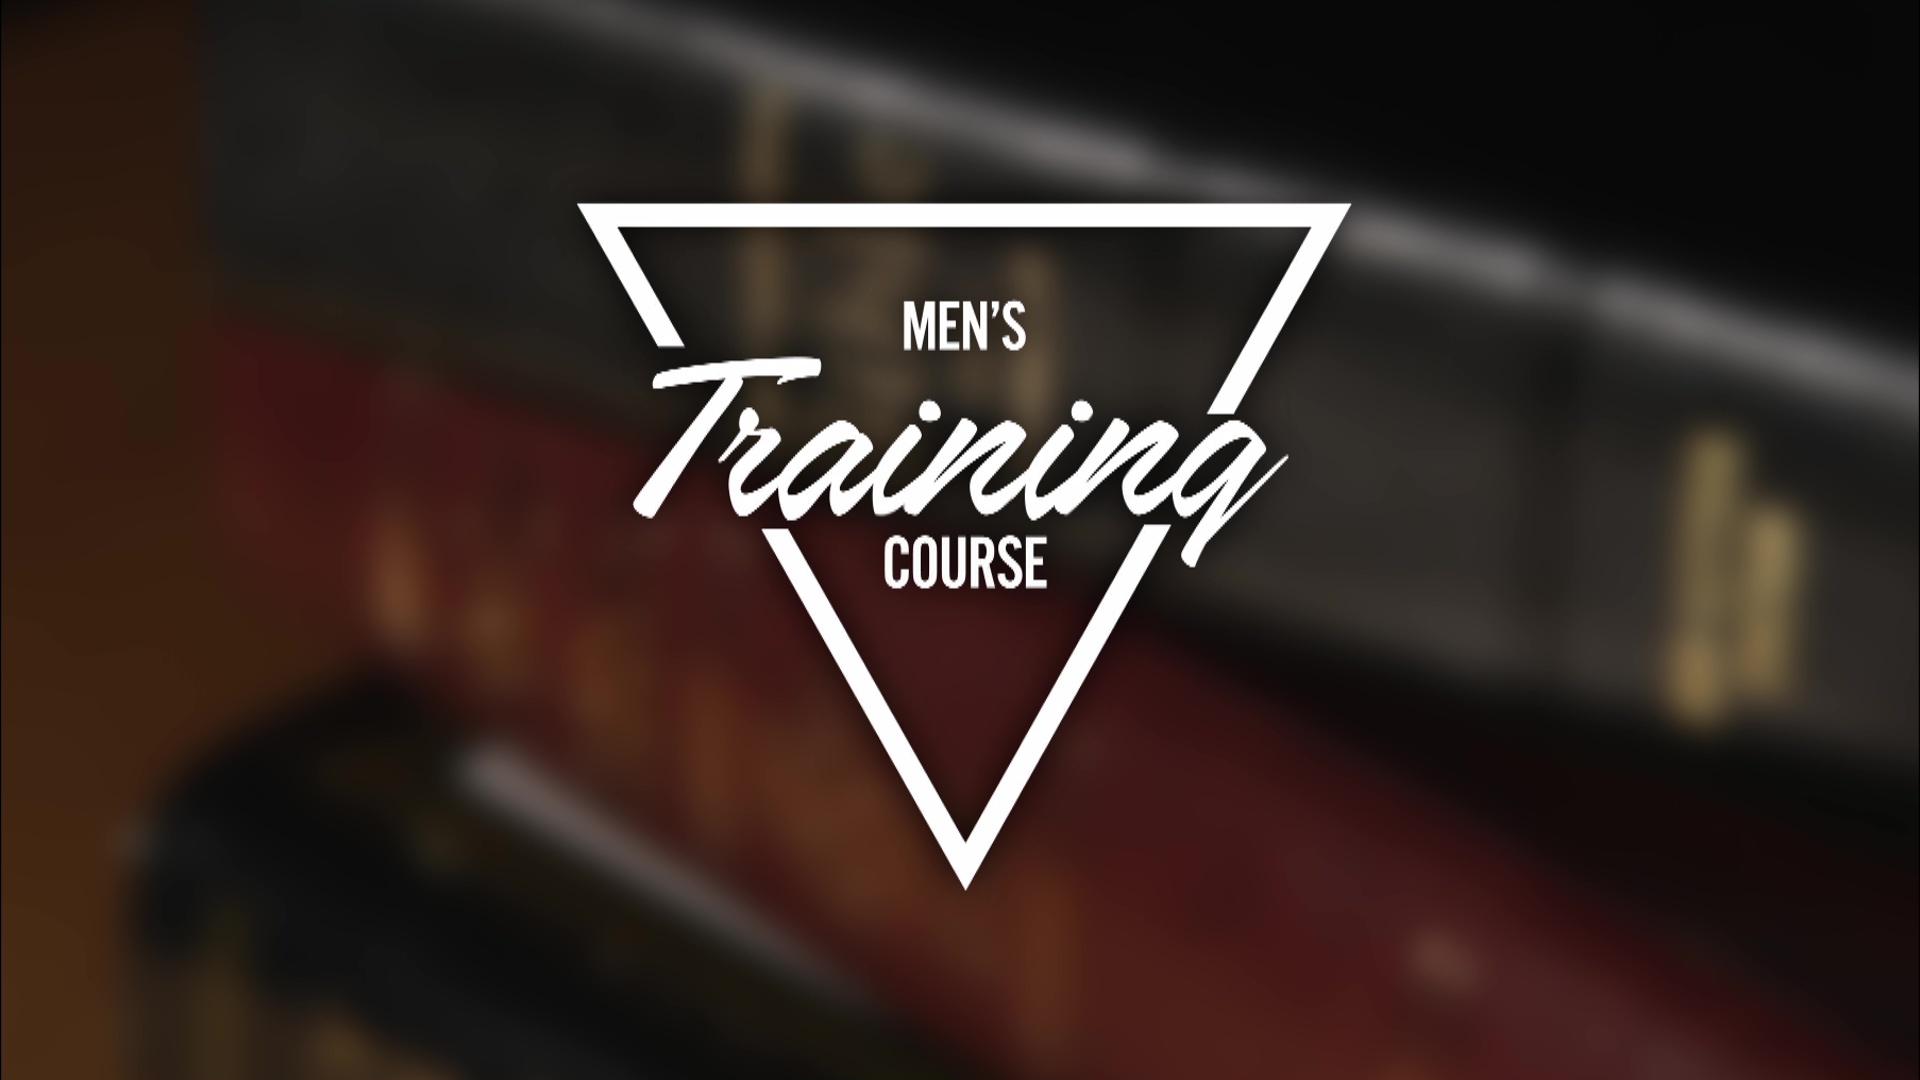 Men's Training Course